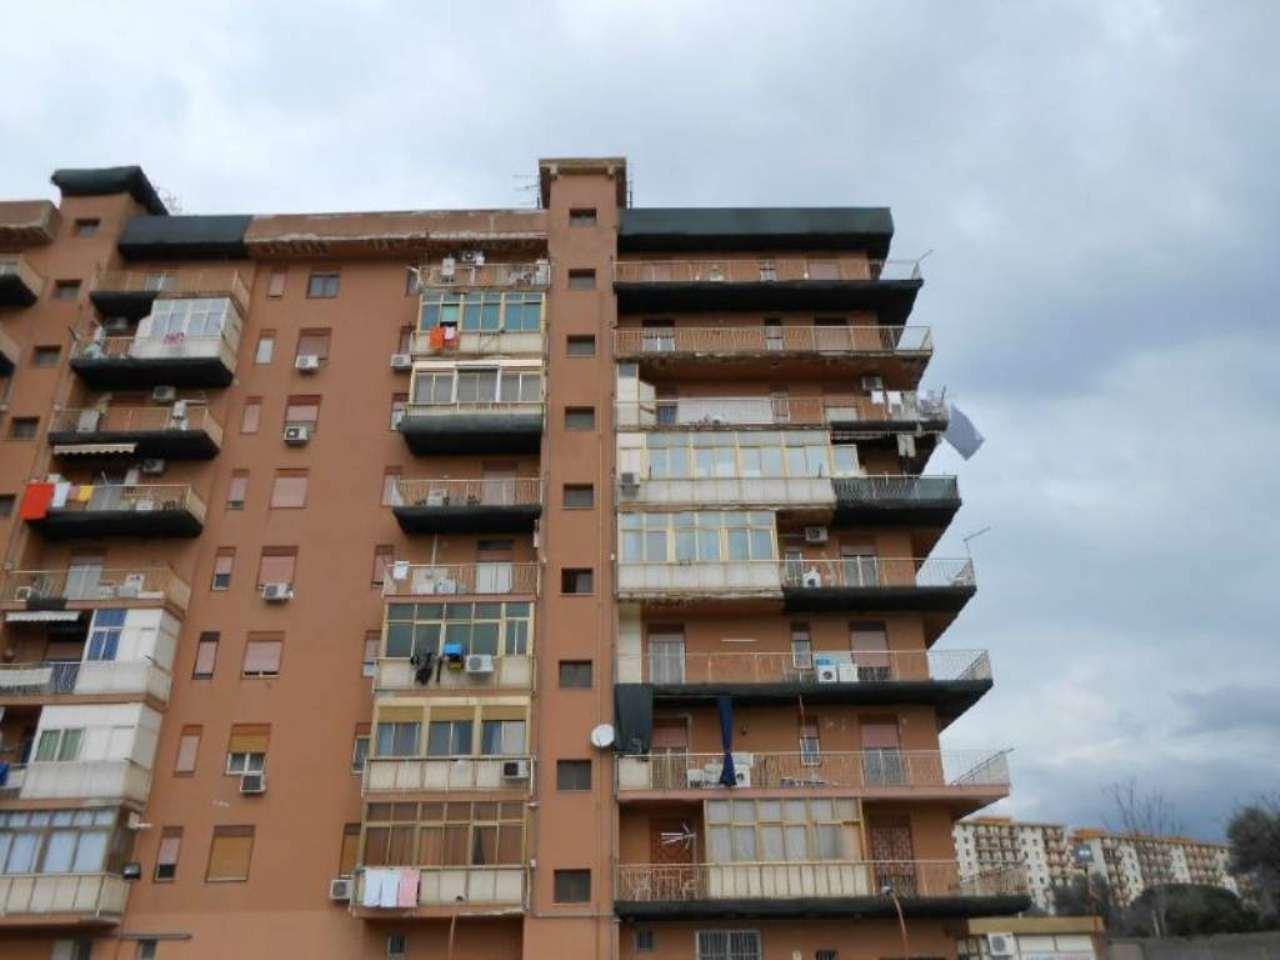 Bilocale Palermo Largo Os 2 7